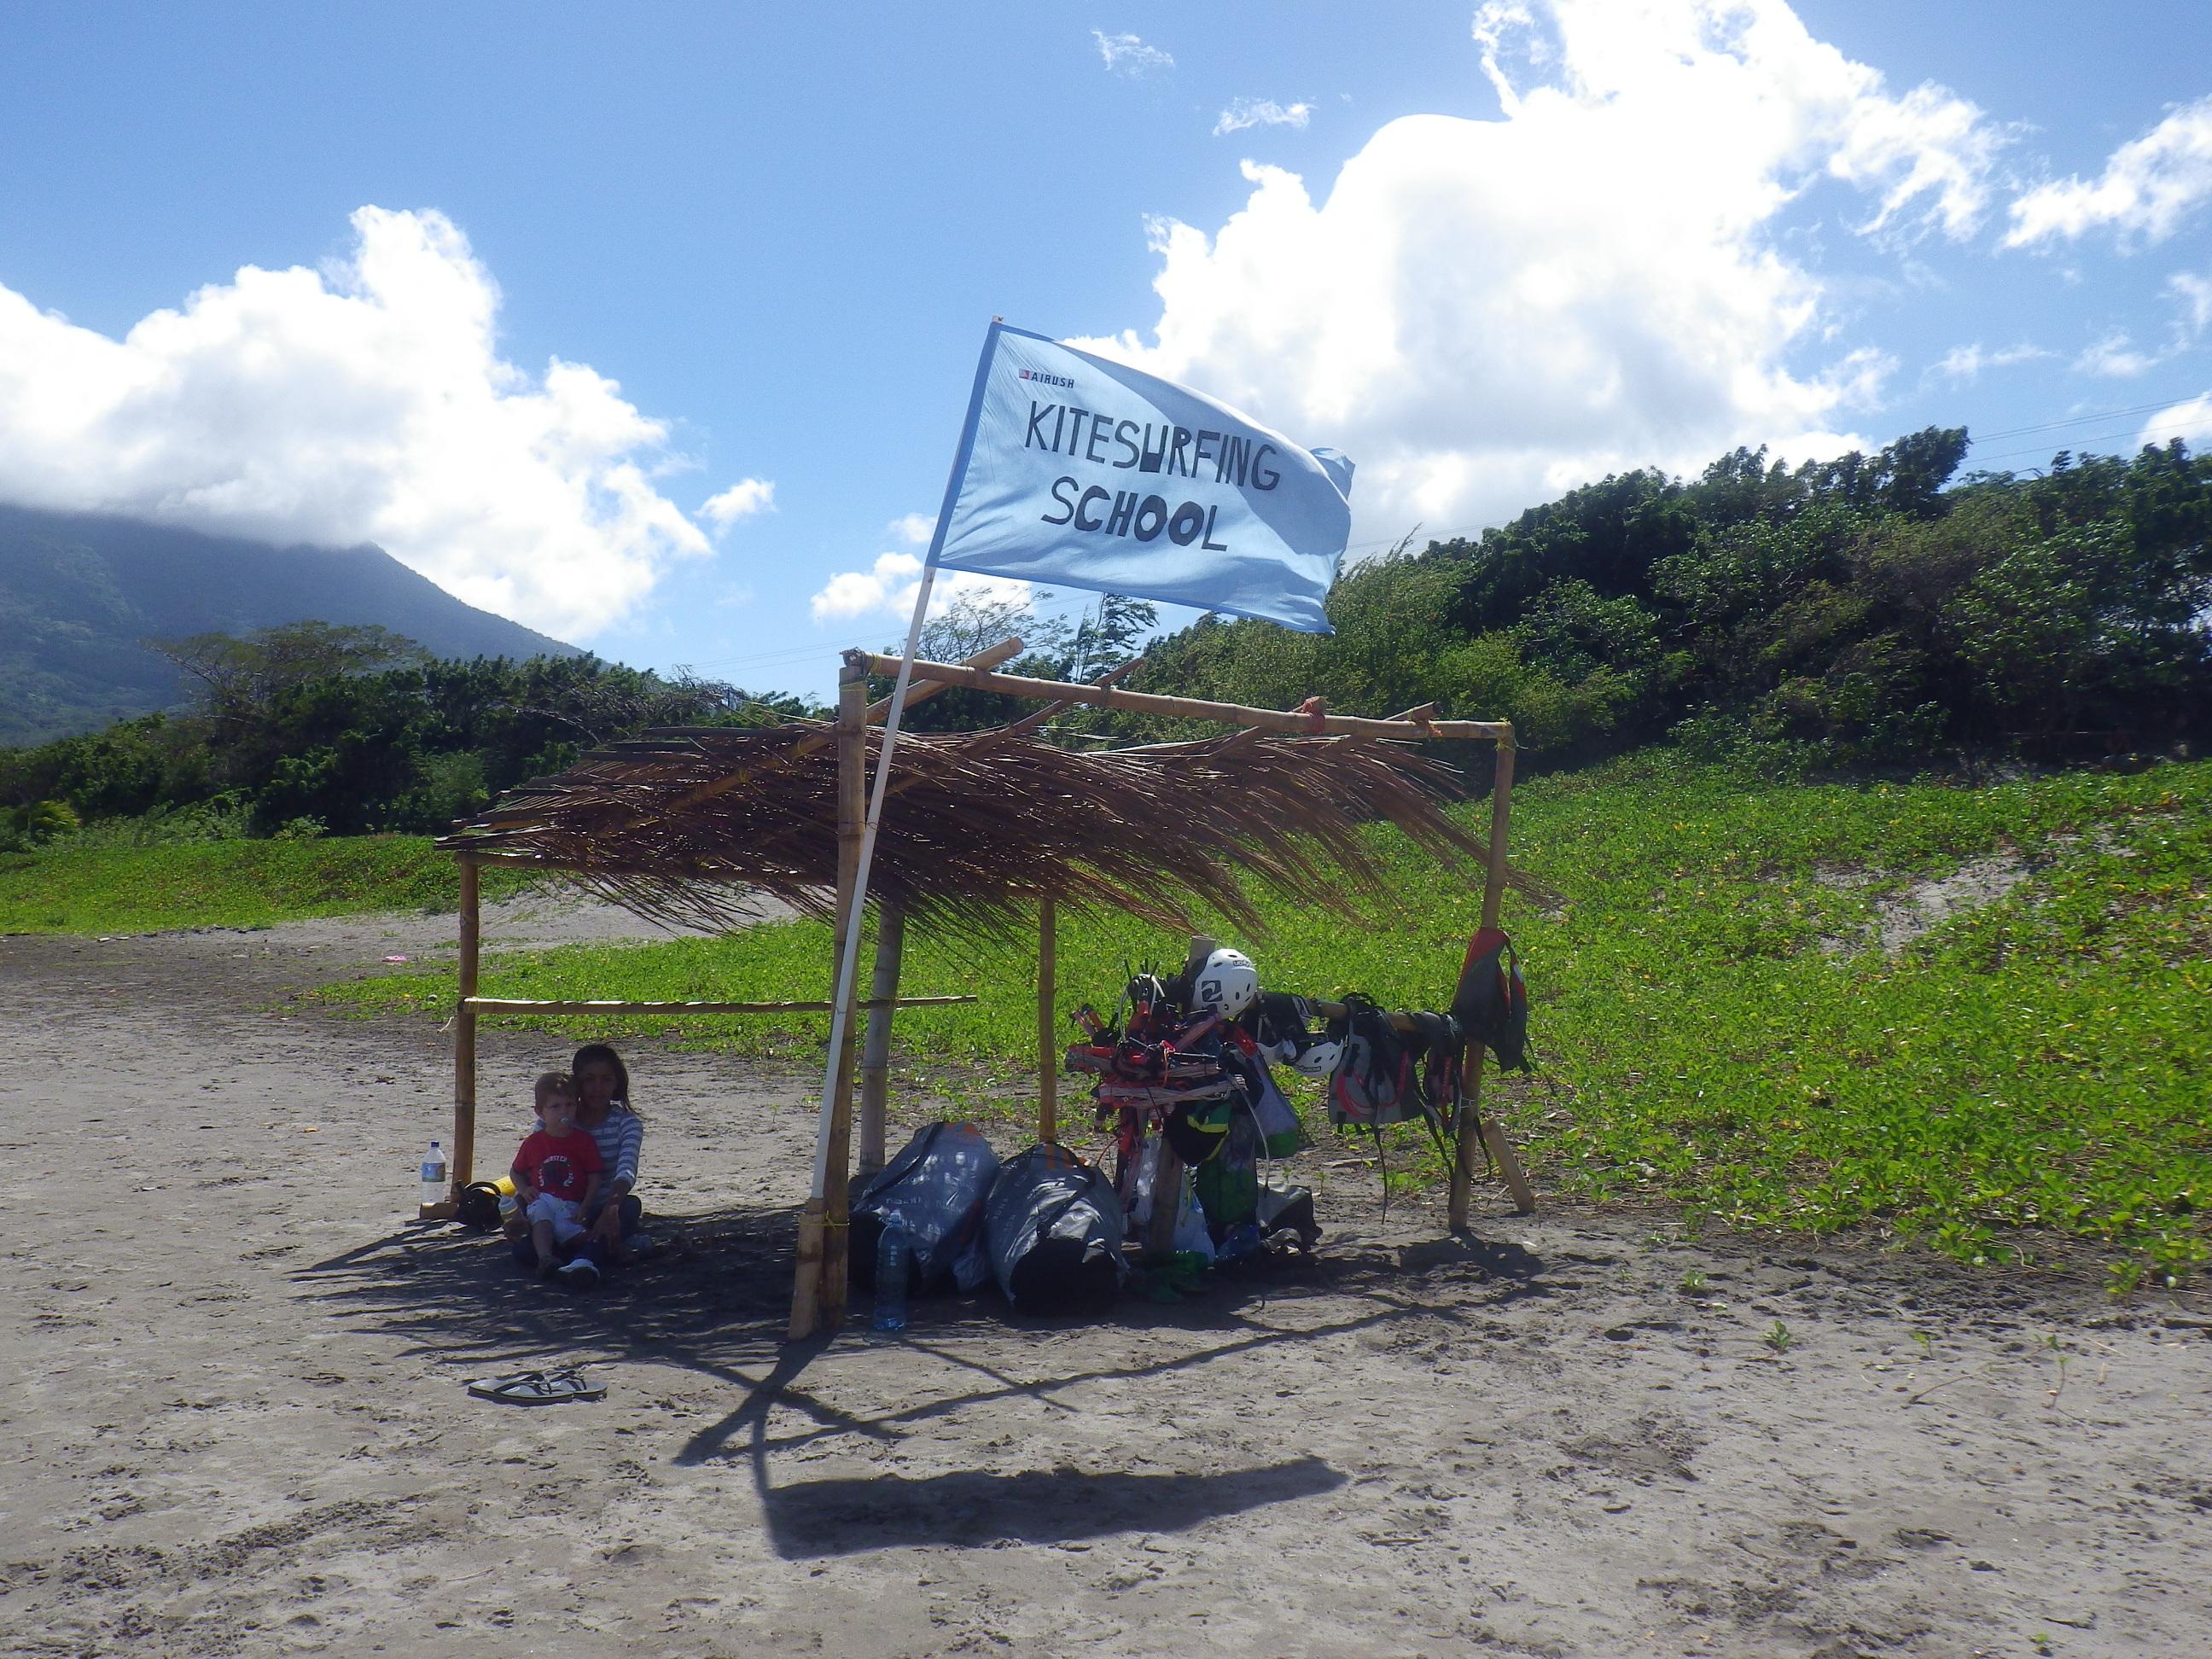 Kitesurfing stand on Ometepe beach